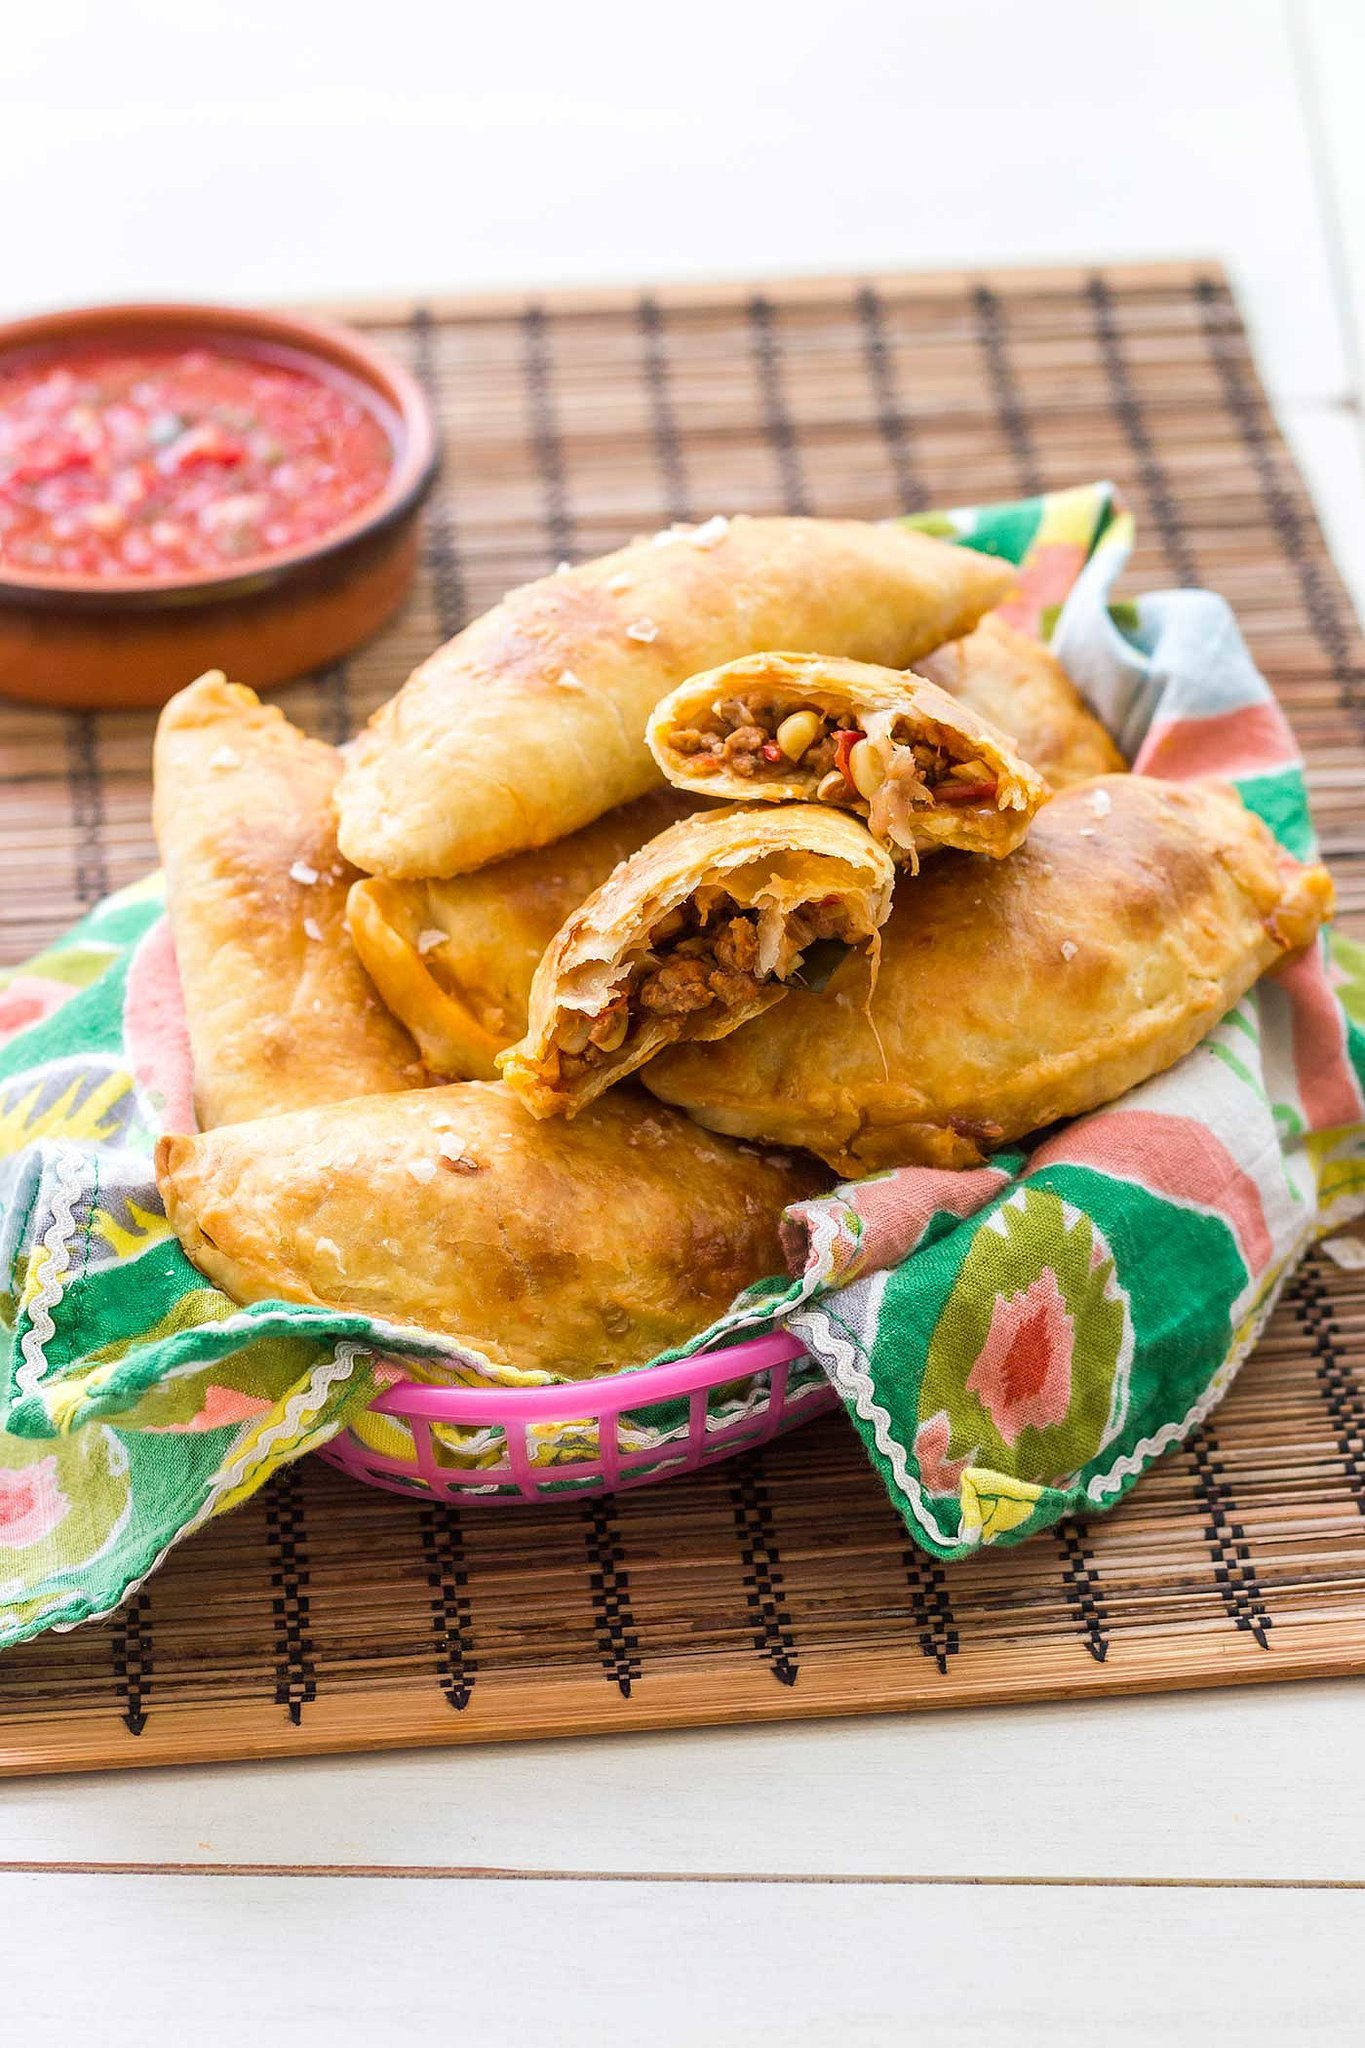 End-of-Summer Empanada